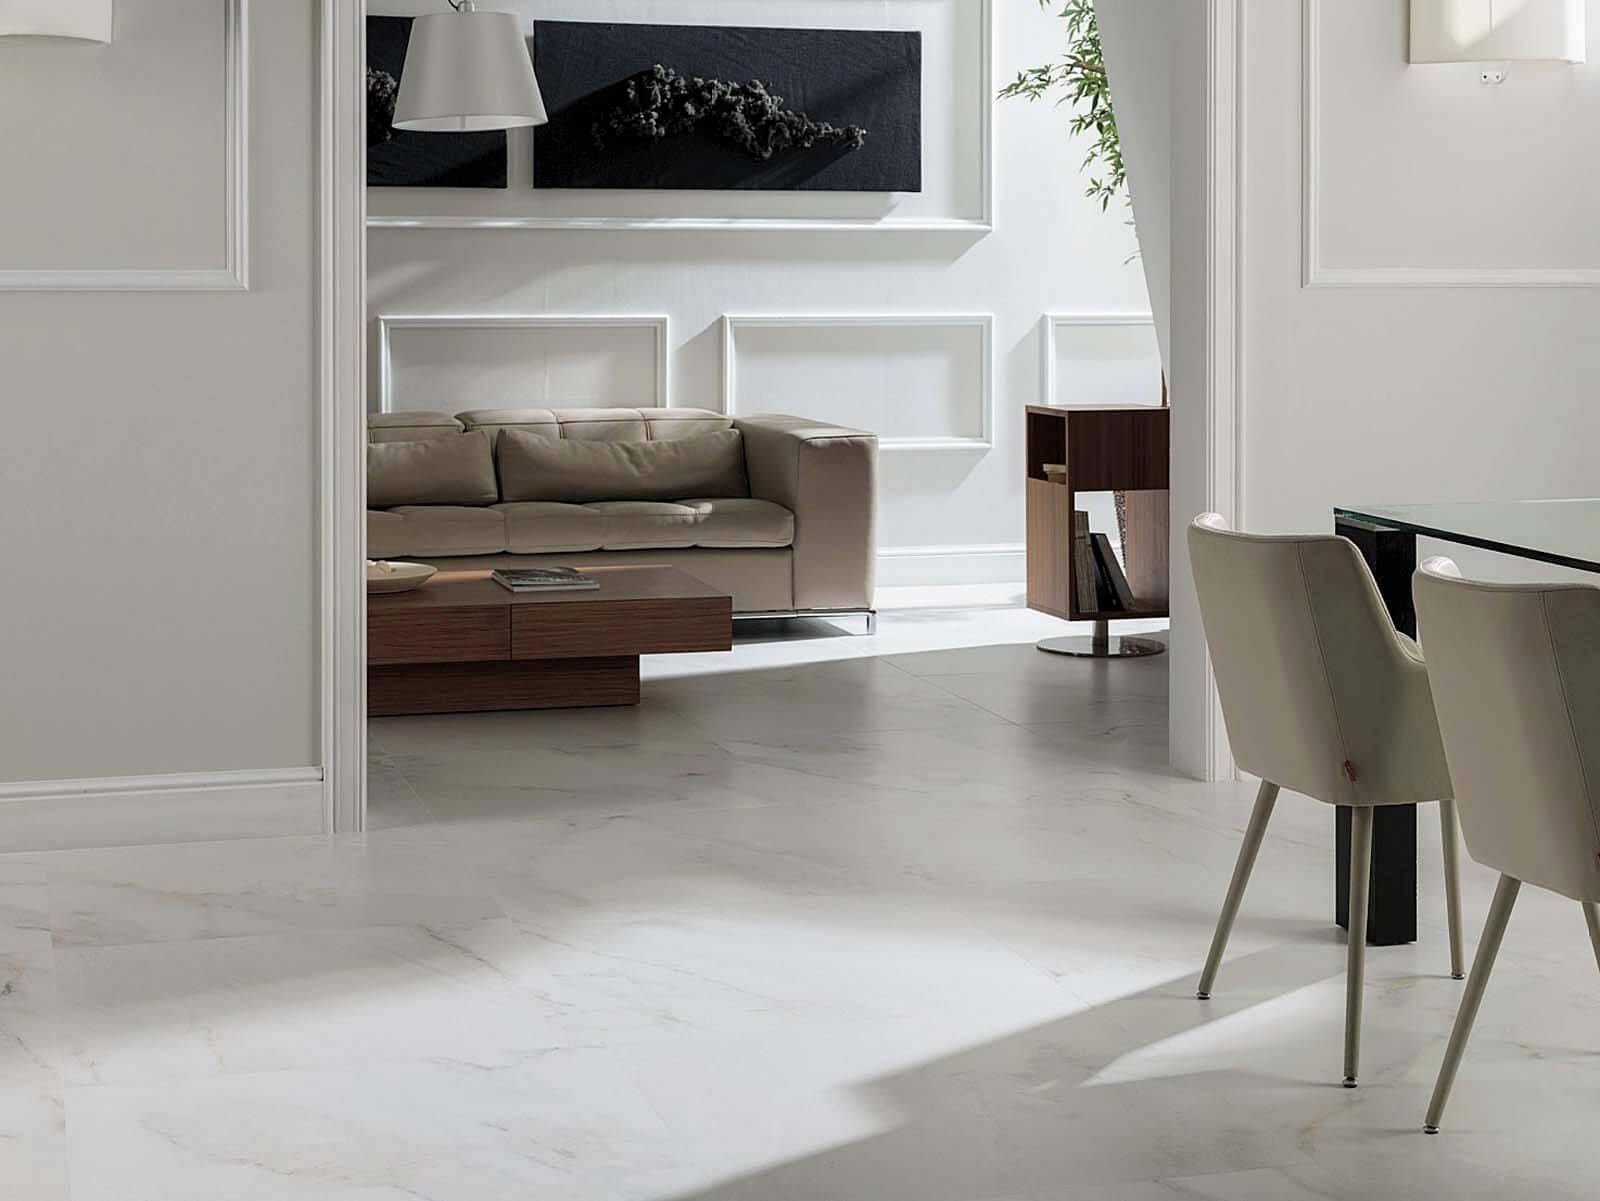 Marmer In Woonkamer : Carrara marmer keuken carrara marmer keuken atumre carrara